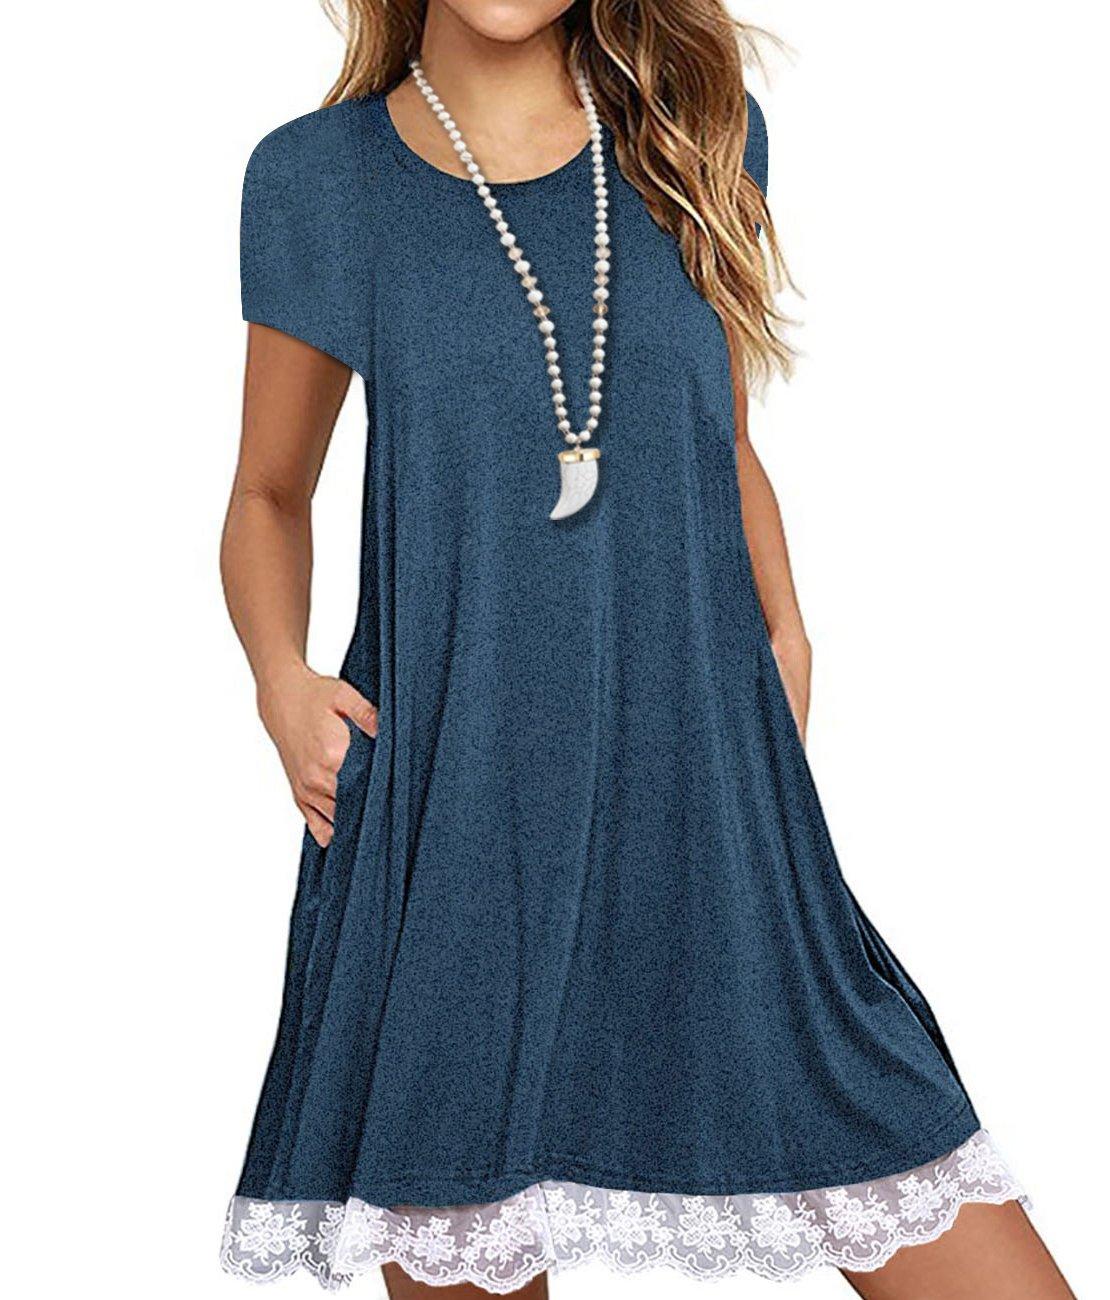 SHFZ Women's Short Sleeve T Shirt Dress Plus Size Summer Lace Tunic Dress with Pockets (XX-Large, Blue)